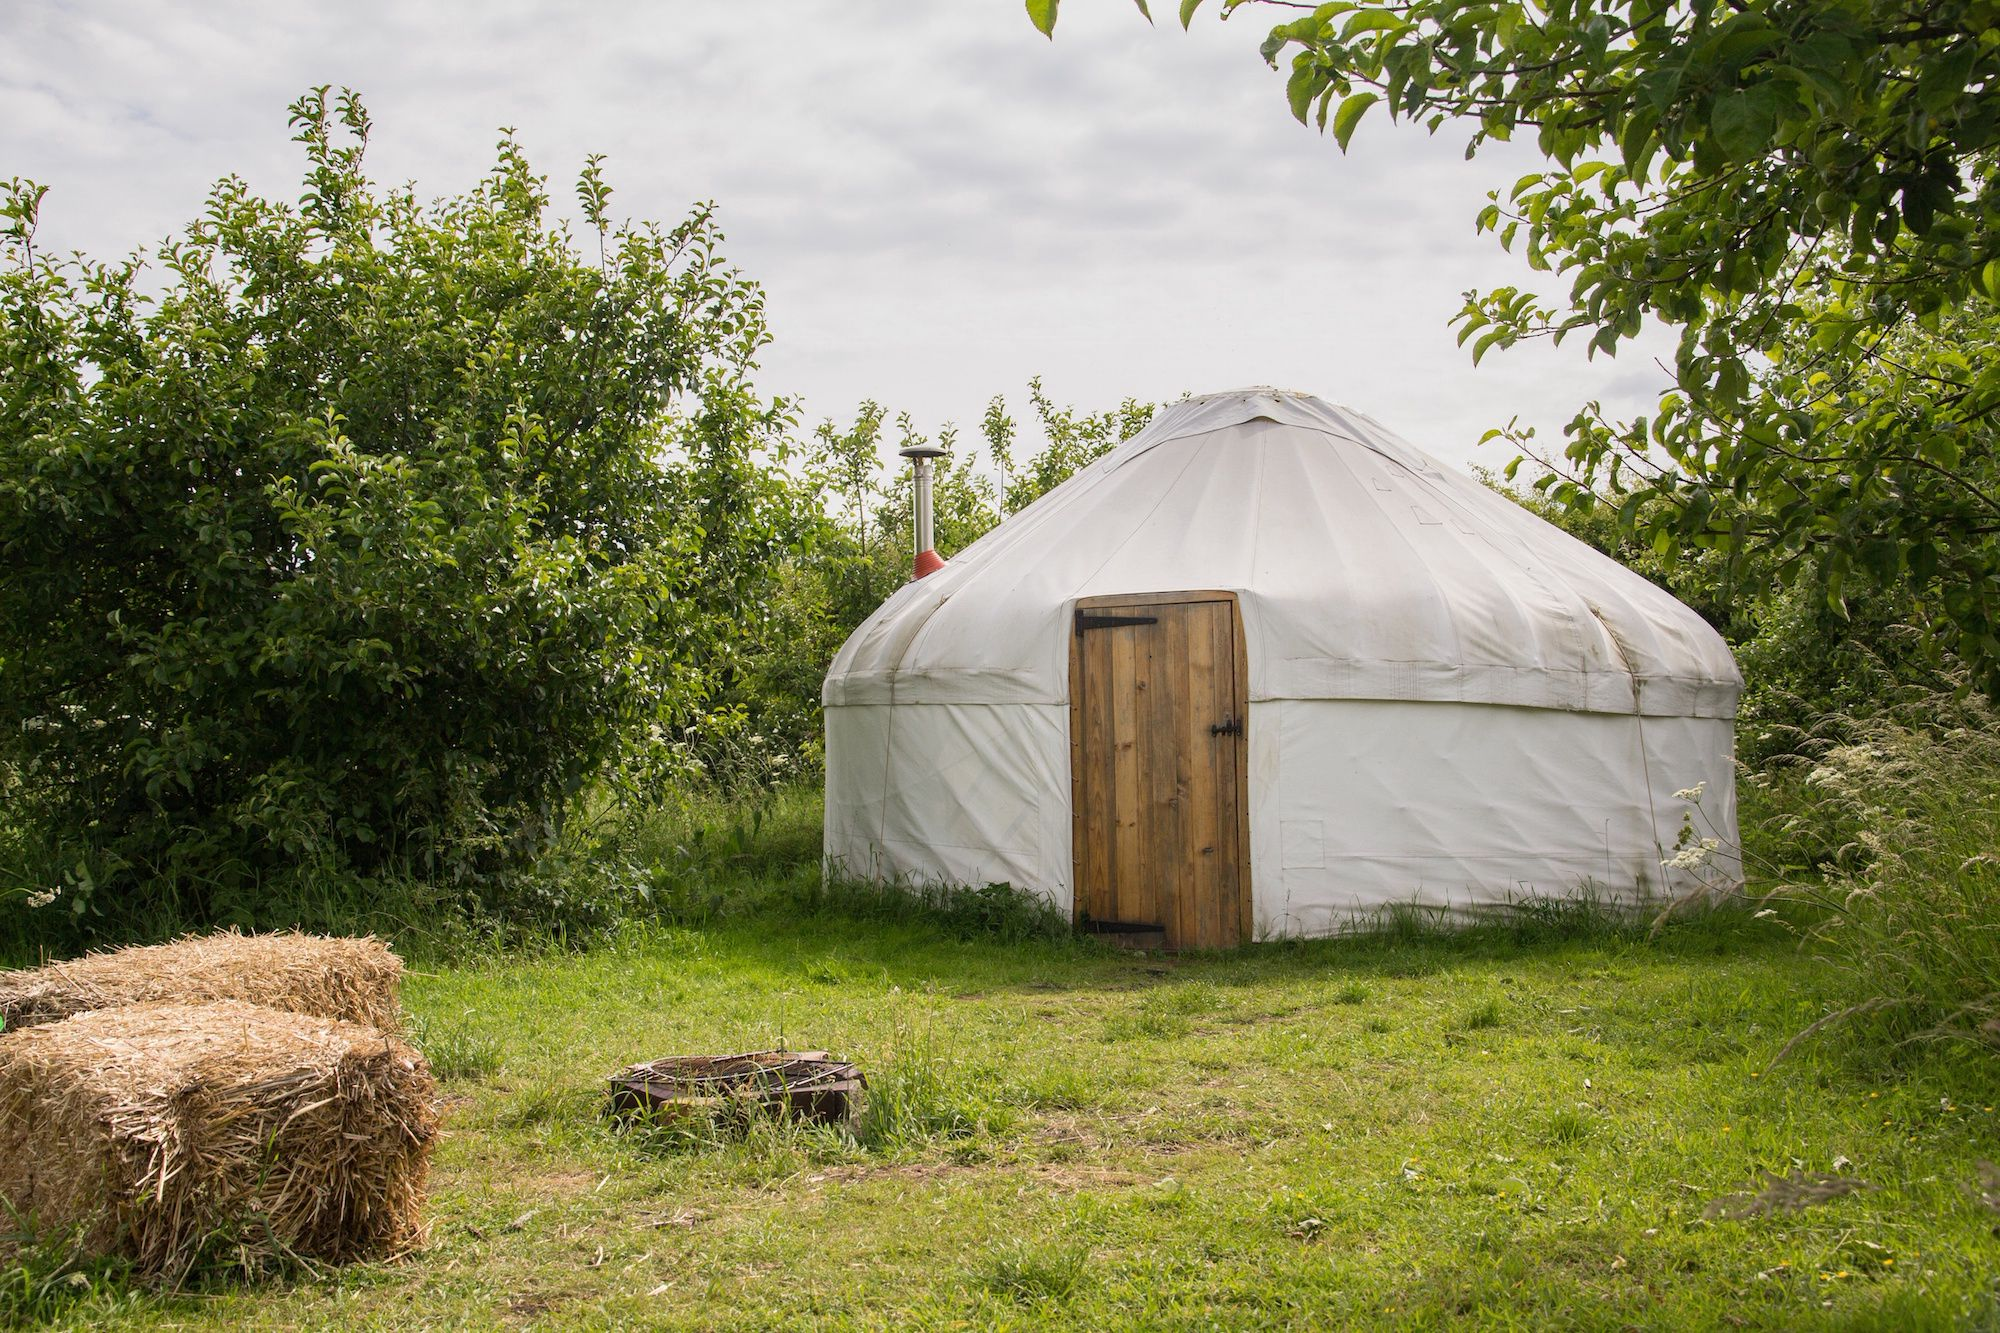 Glamping & Luxury Camping